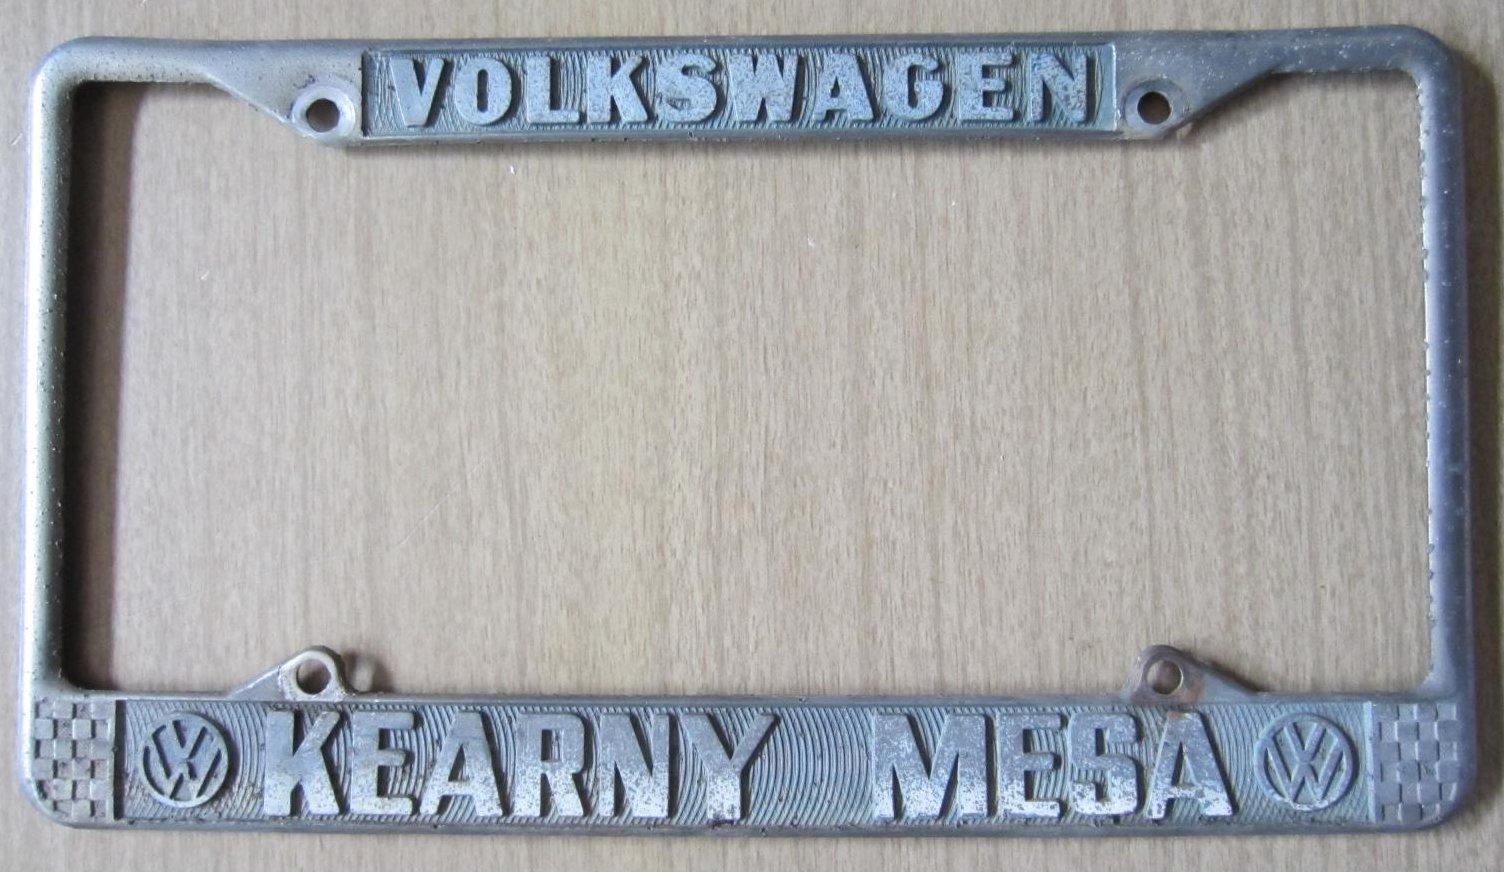 Kearny Mesa Volkswagen